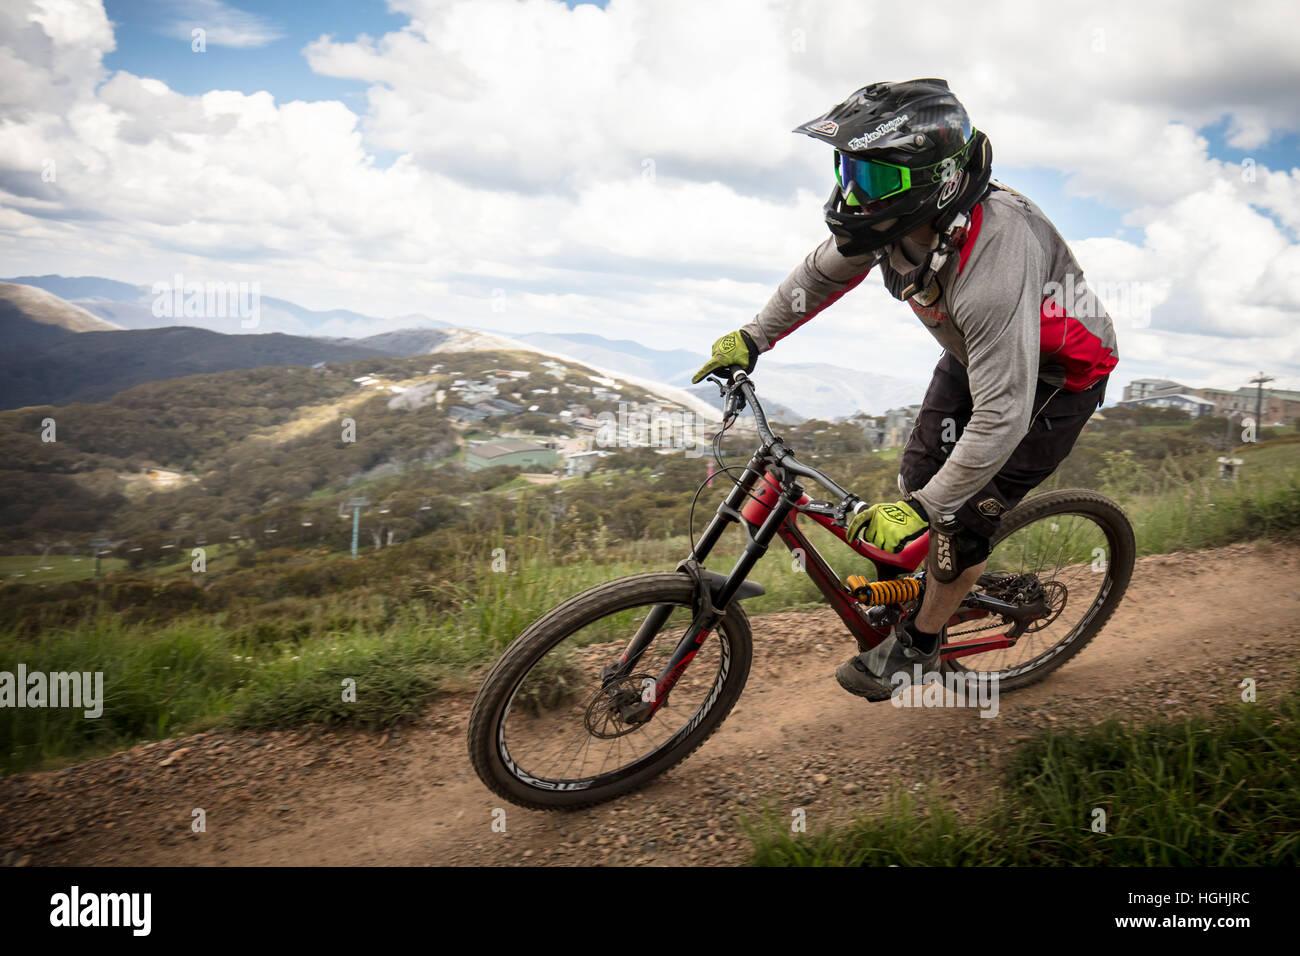 Mountain Bike Riders At Mt Buller Stock Photo Royalty Free Image